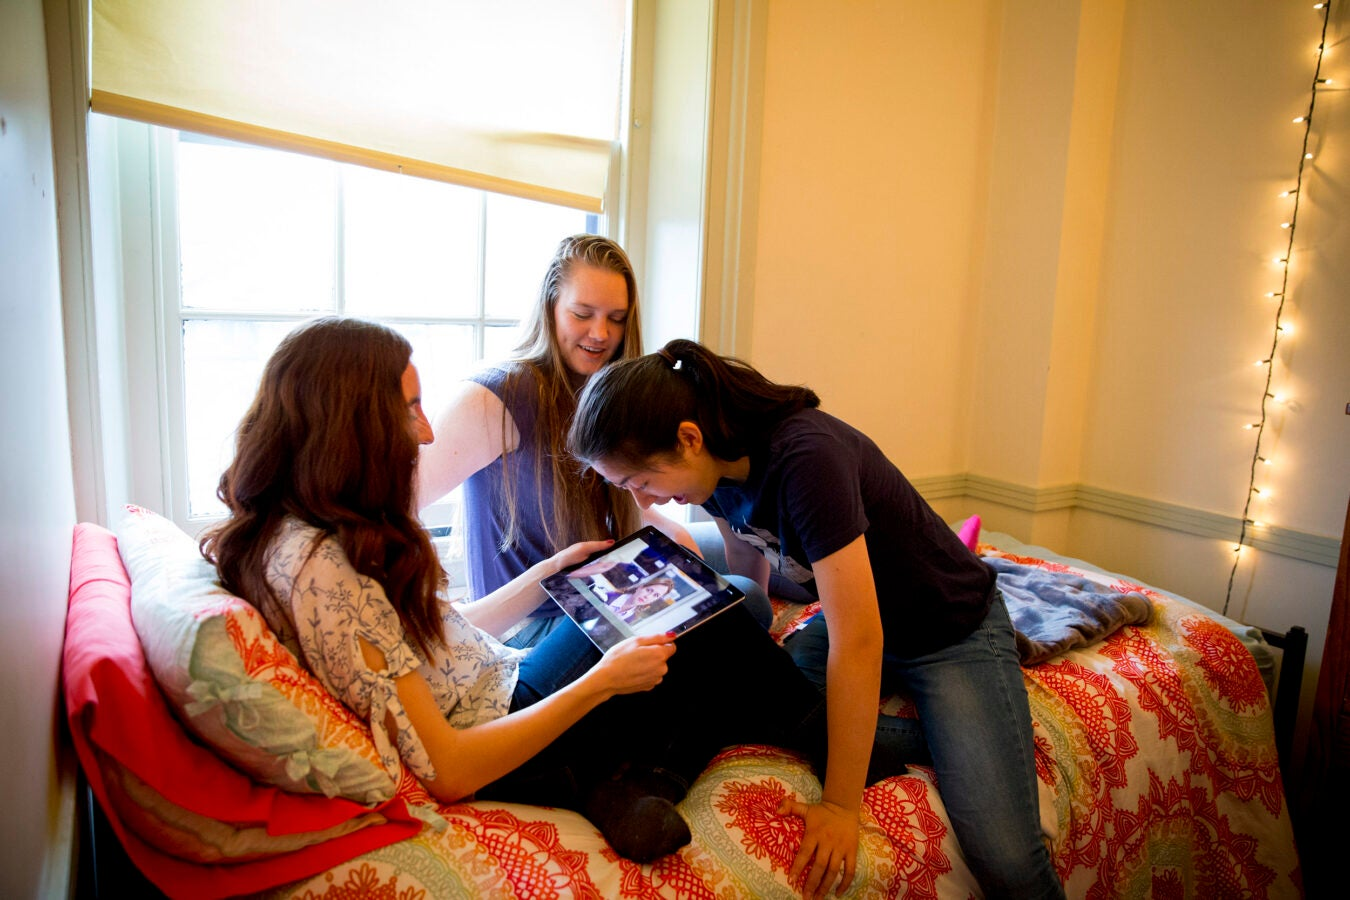 Thayer House freshmen friends, Kristie Colton, '20 of Utah (from left); Georgia Seidel, '20 of Australia, and Rebecca Chen, '20 of California binge watch The Office.